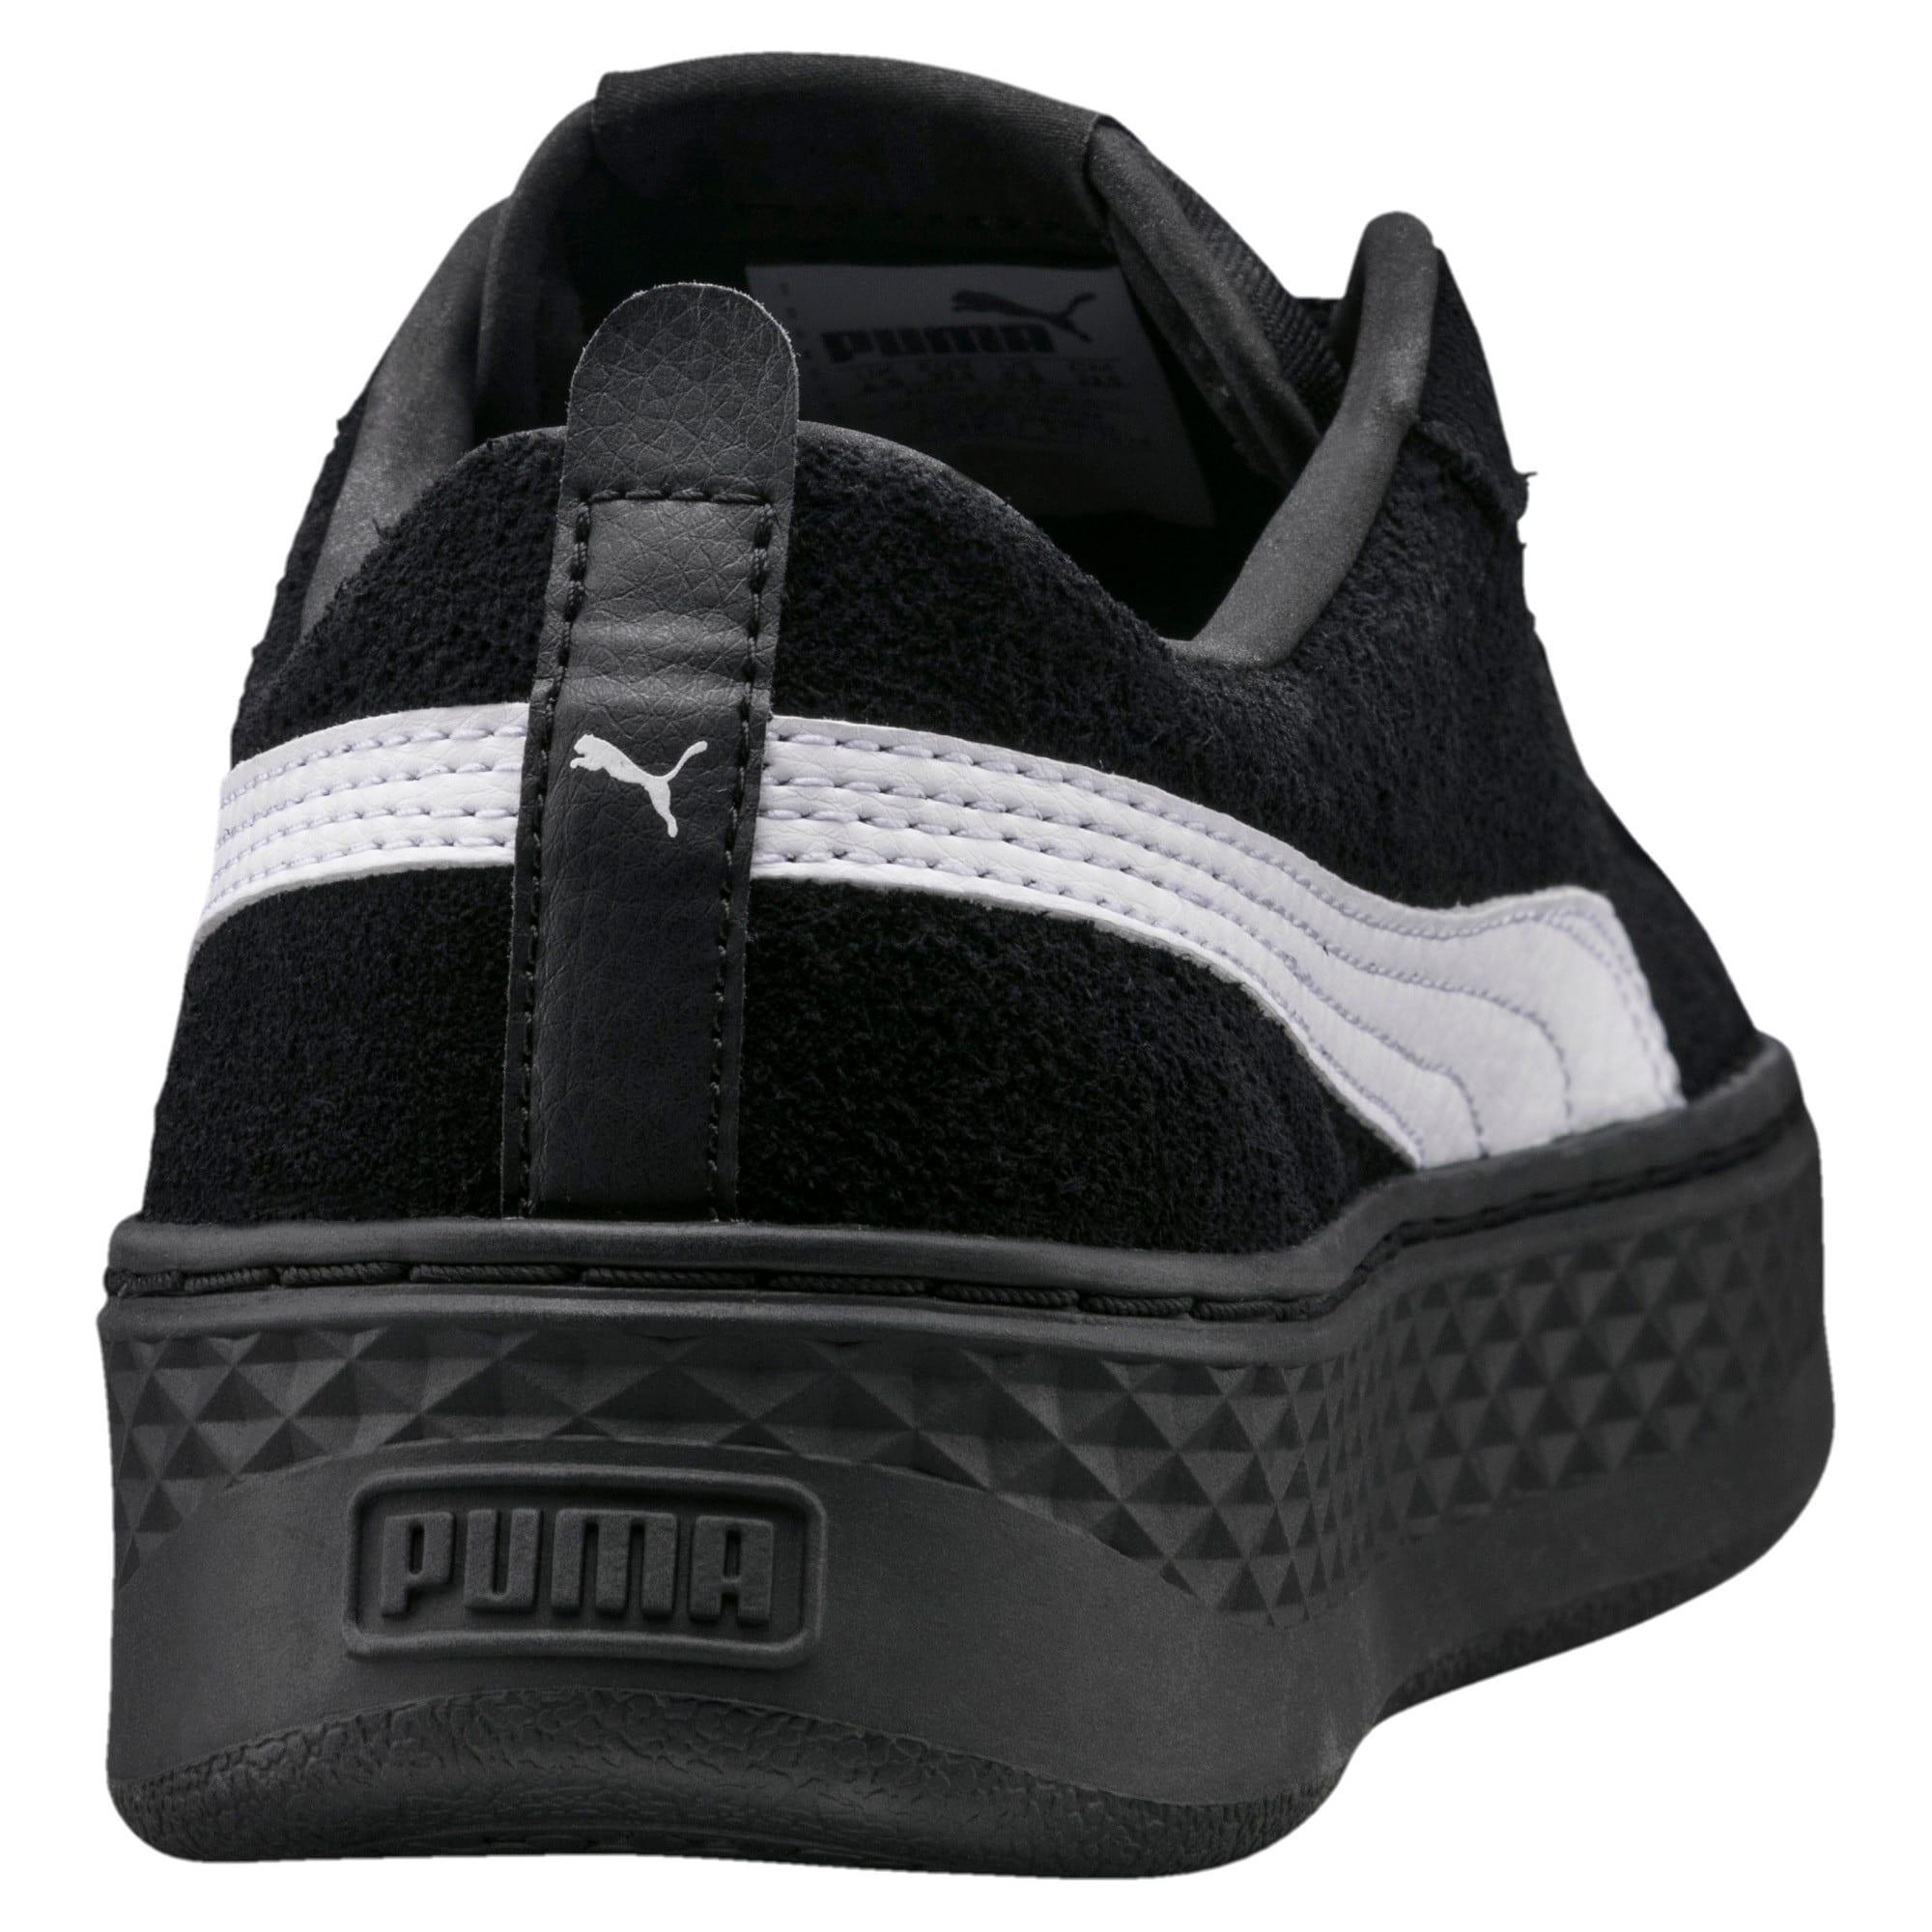 Thumbnail 2 of Smash Platform Suede Women's Trainers, Puma Black-Puma White, medium-IND